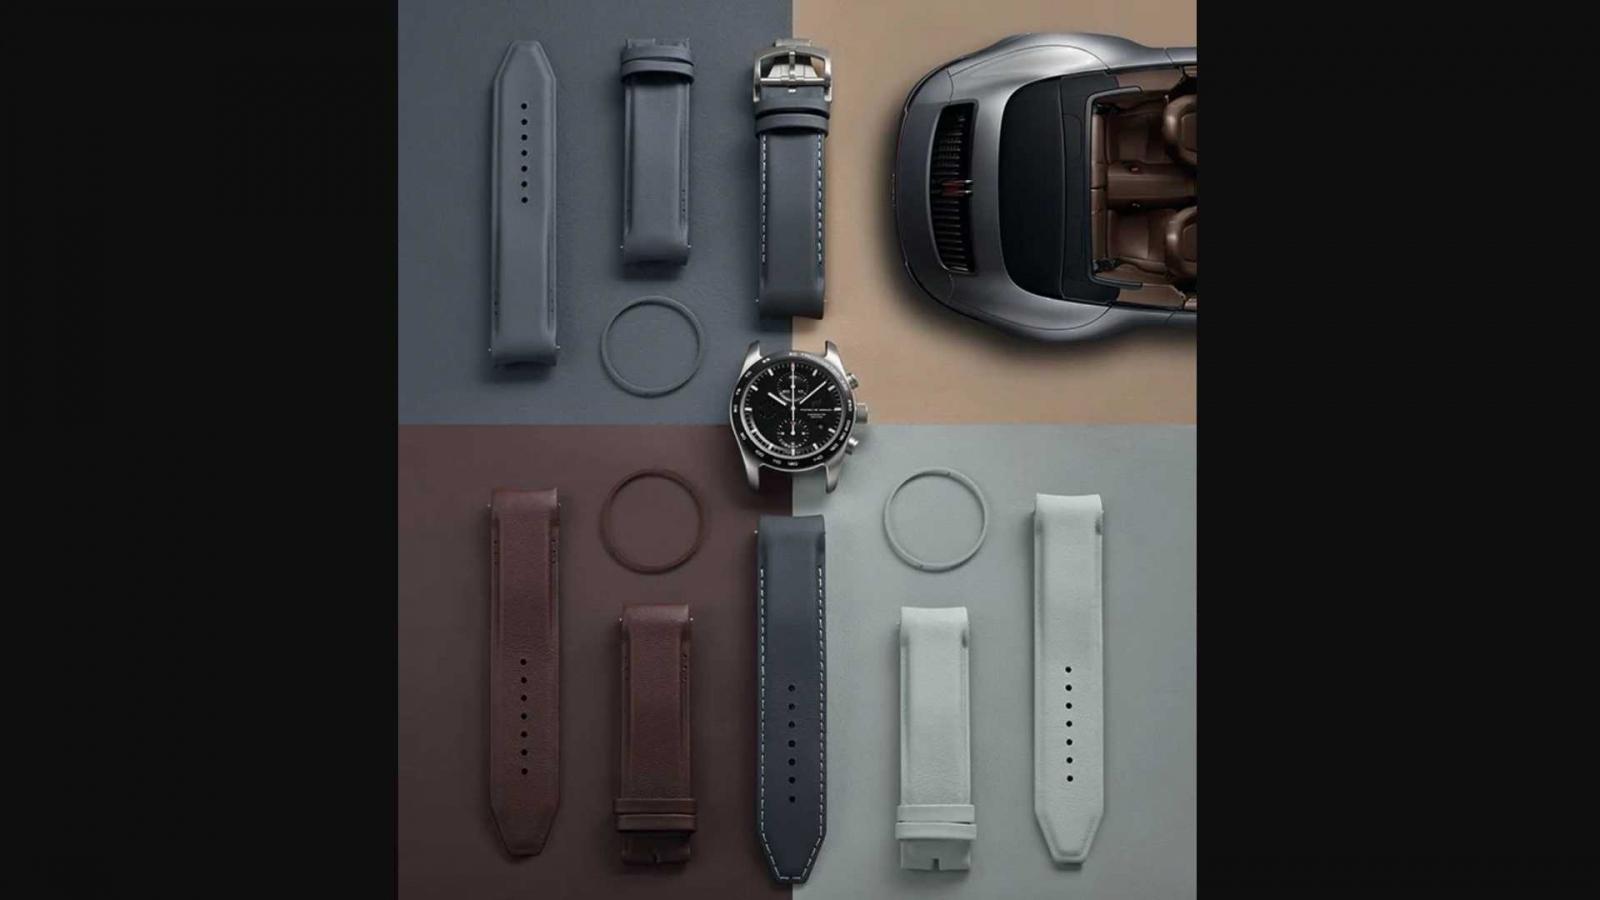 Porsche giới thiệu cấu hình của đồng hồ Porsche Design